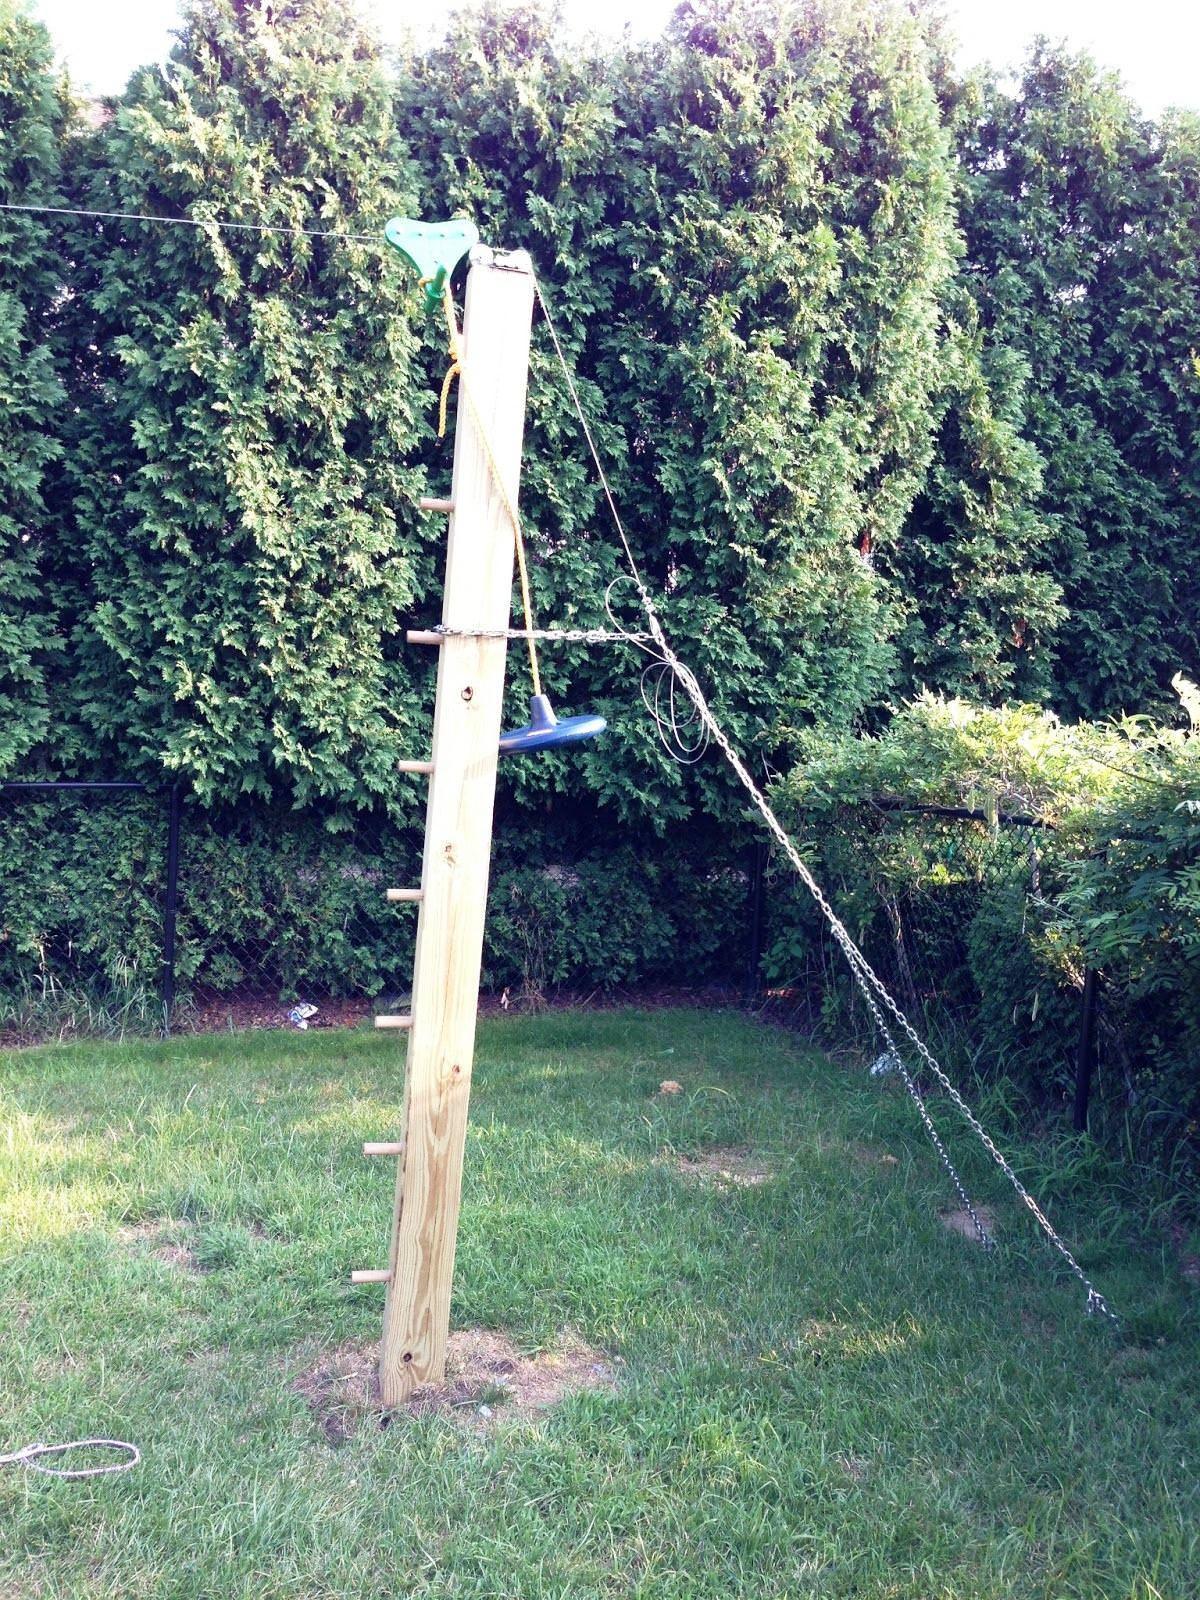 building zip line your backyard garden inspiration pinterest